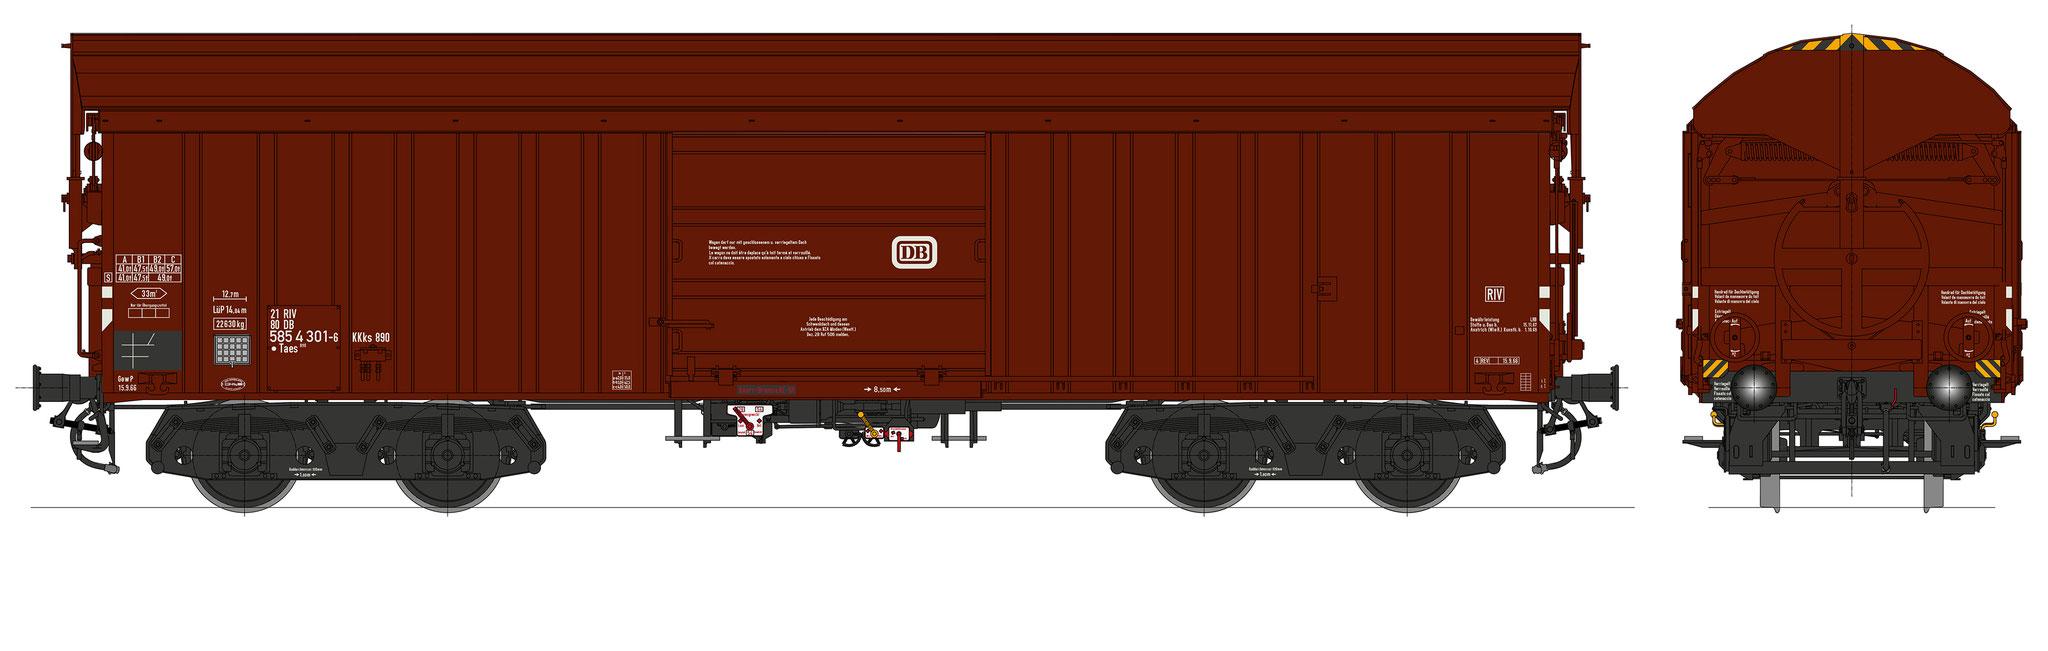 Bestell-Nr. 16061, Ep. 3b/4a, Fahrgestell schwarz